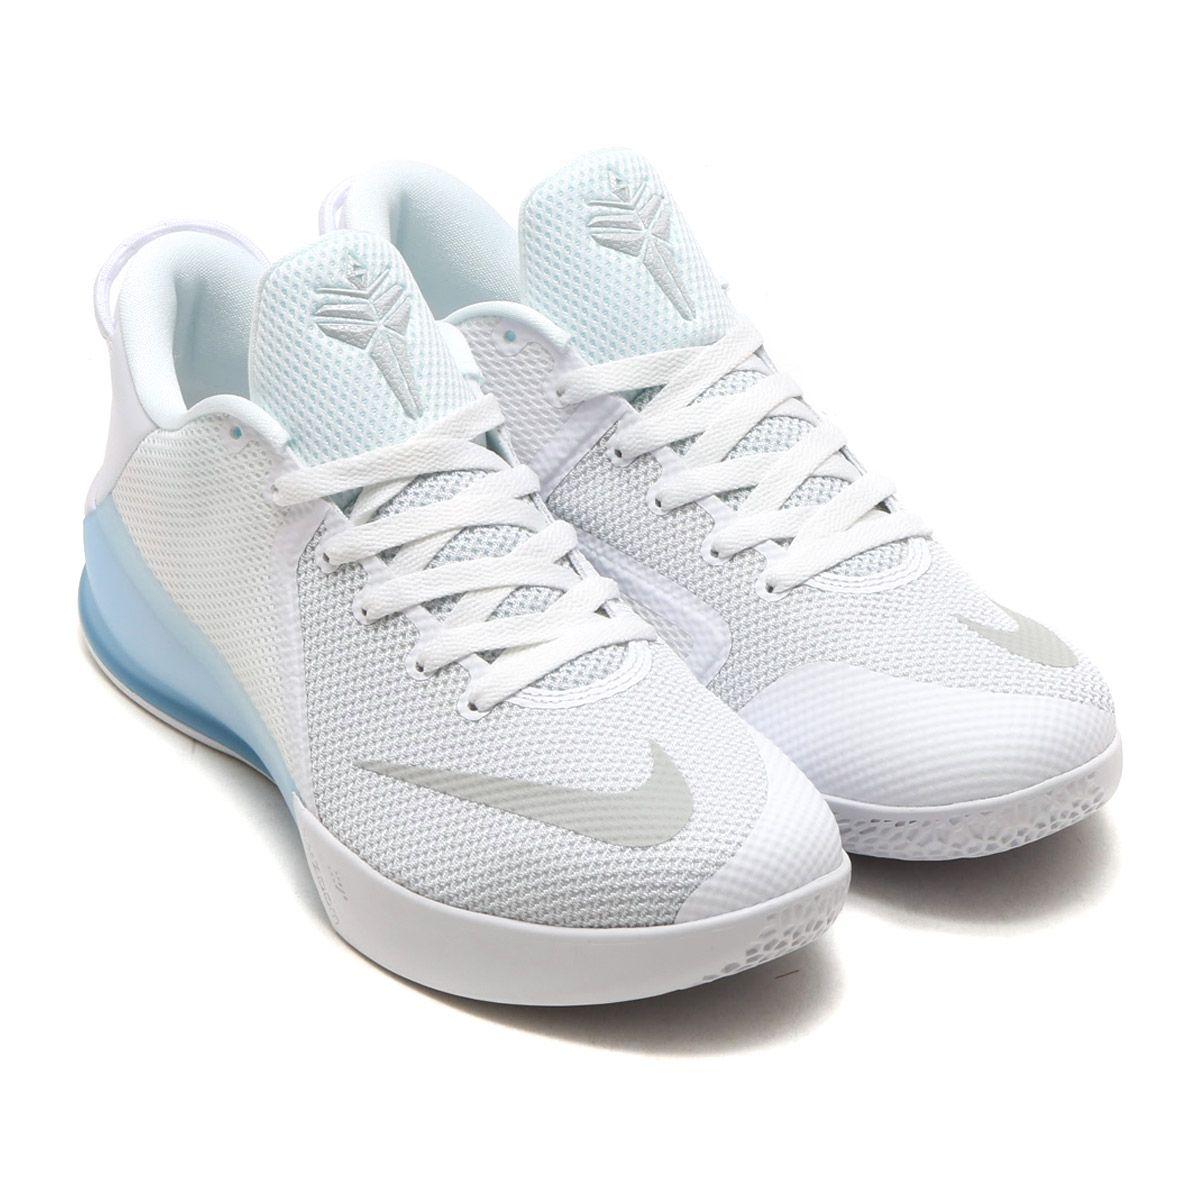 Nike Zoom Kobe Venomenon 6 Ep White Pure Platinum Blue Basketball Shoes Girls Basketball Shoes Womens Basketball Shoes